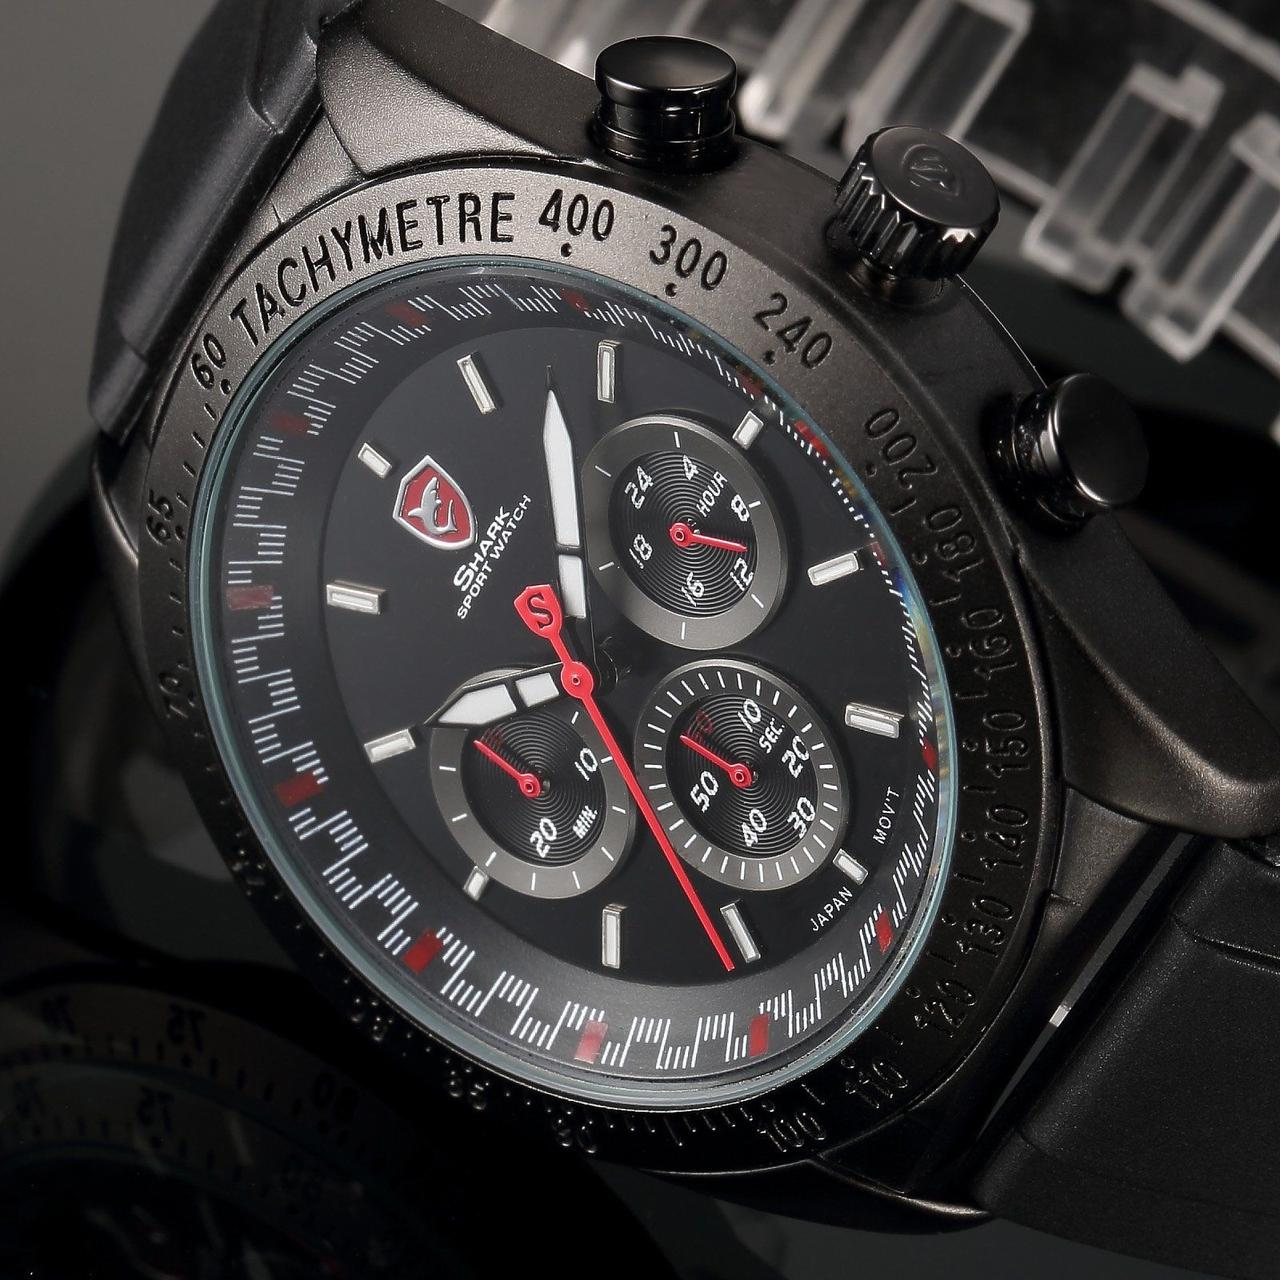 Мужские наручные часы Shark SH271 Men's Red Dashboard Dial Chronograph Analog Quartz Sport Watch